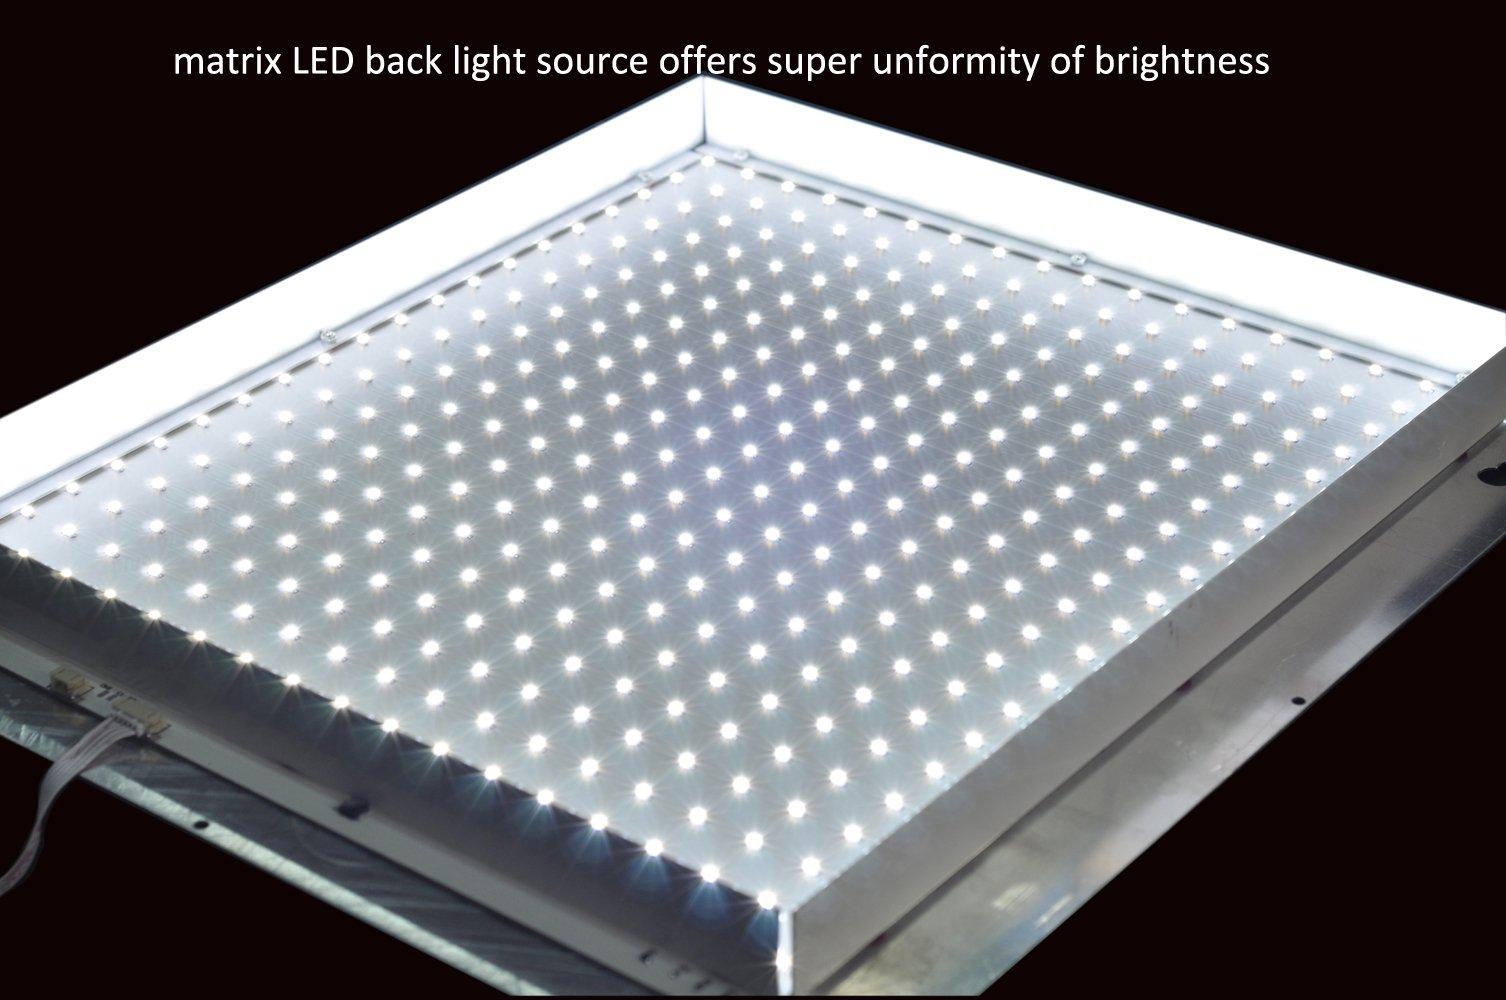 LED X-Ray Film Viewer Negatoscope Xray View Box illuminator Medical Film Viewer (Double Bank) by Medplan (Image #7)